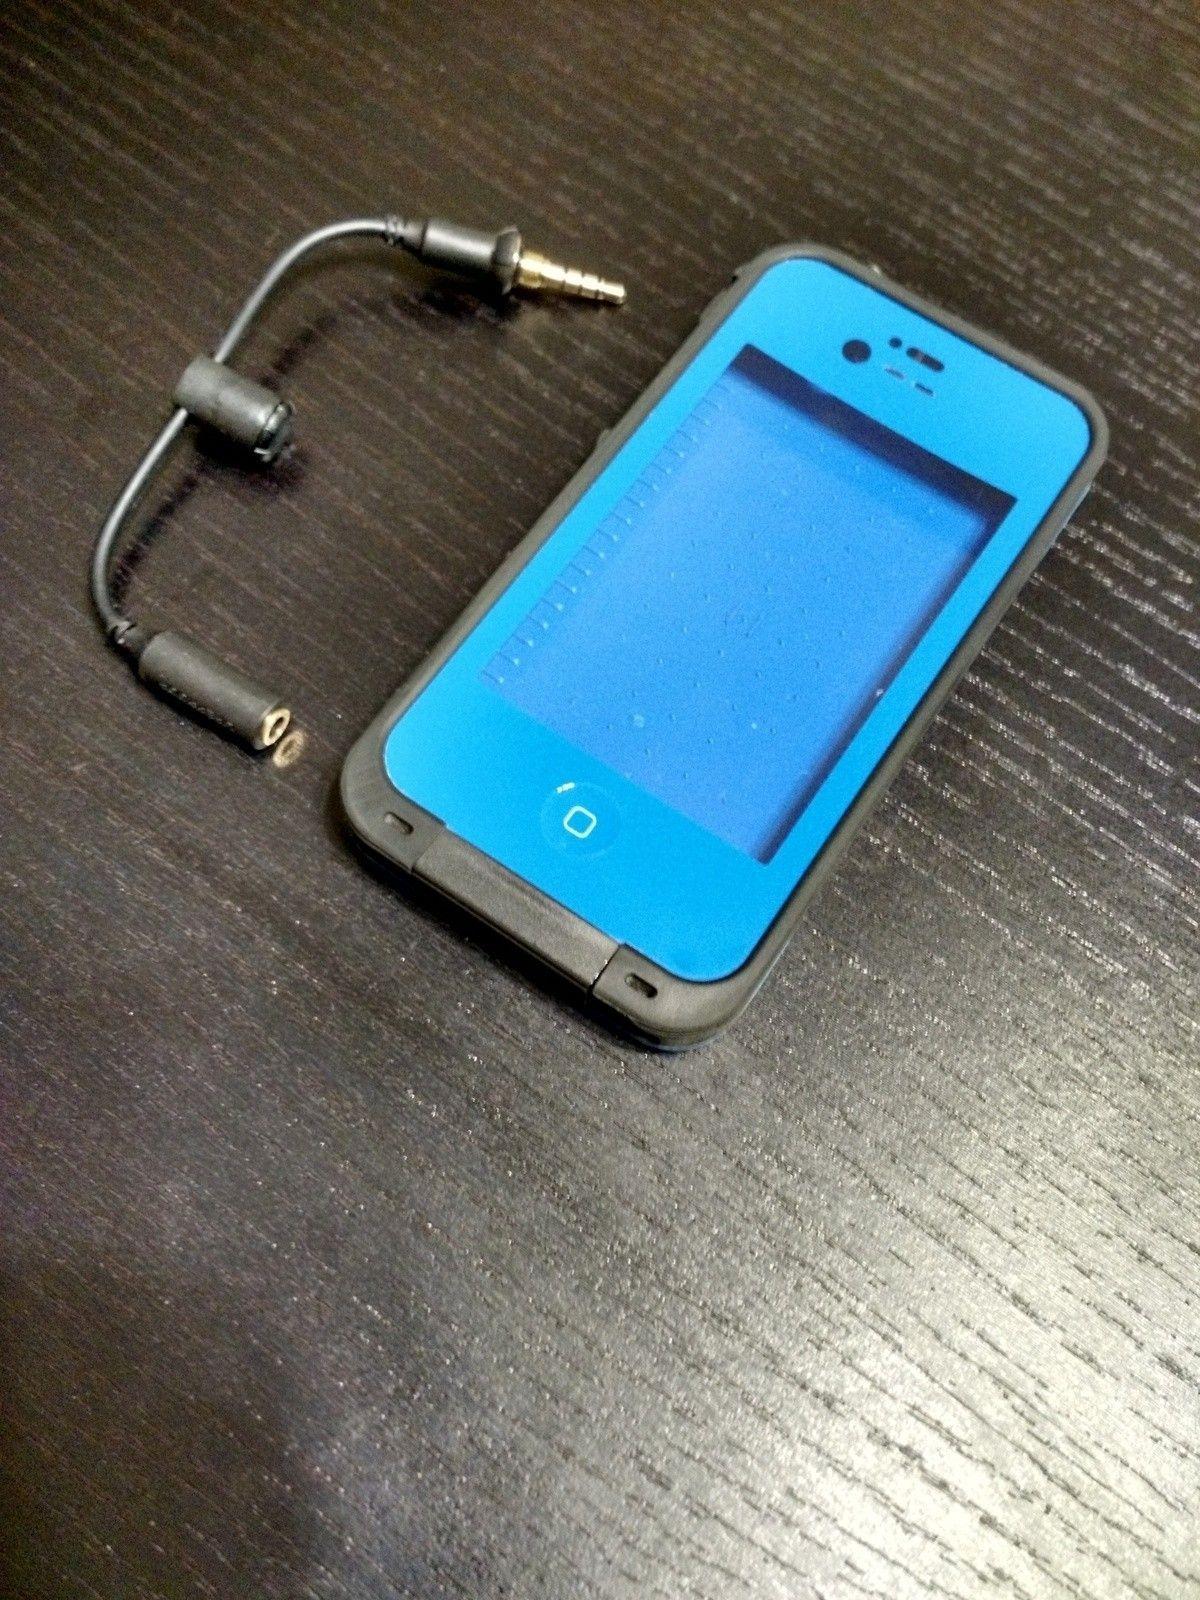 Oakley watch soft case and 2 iphone 4/4s case - uploadfromtaptalk1416110437753.jpg